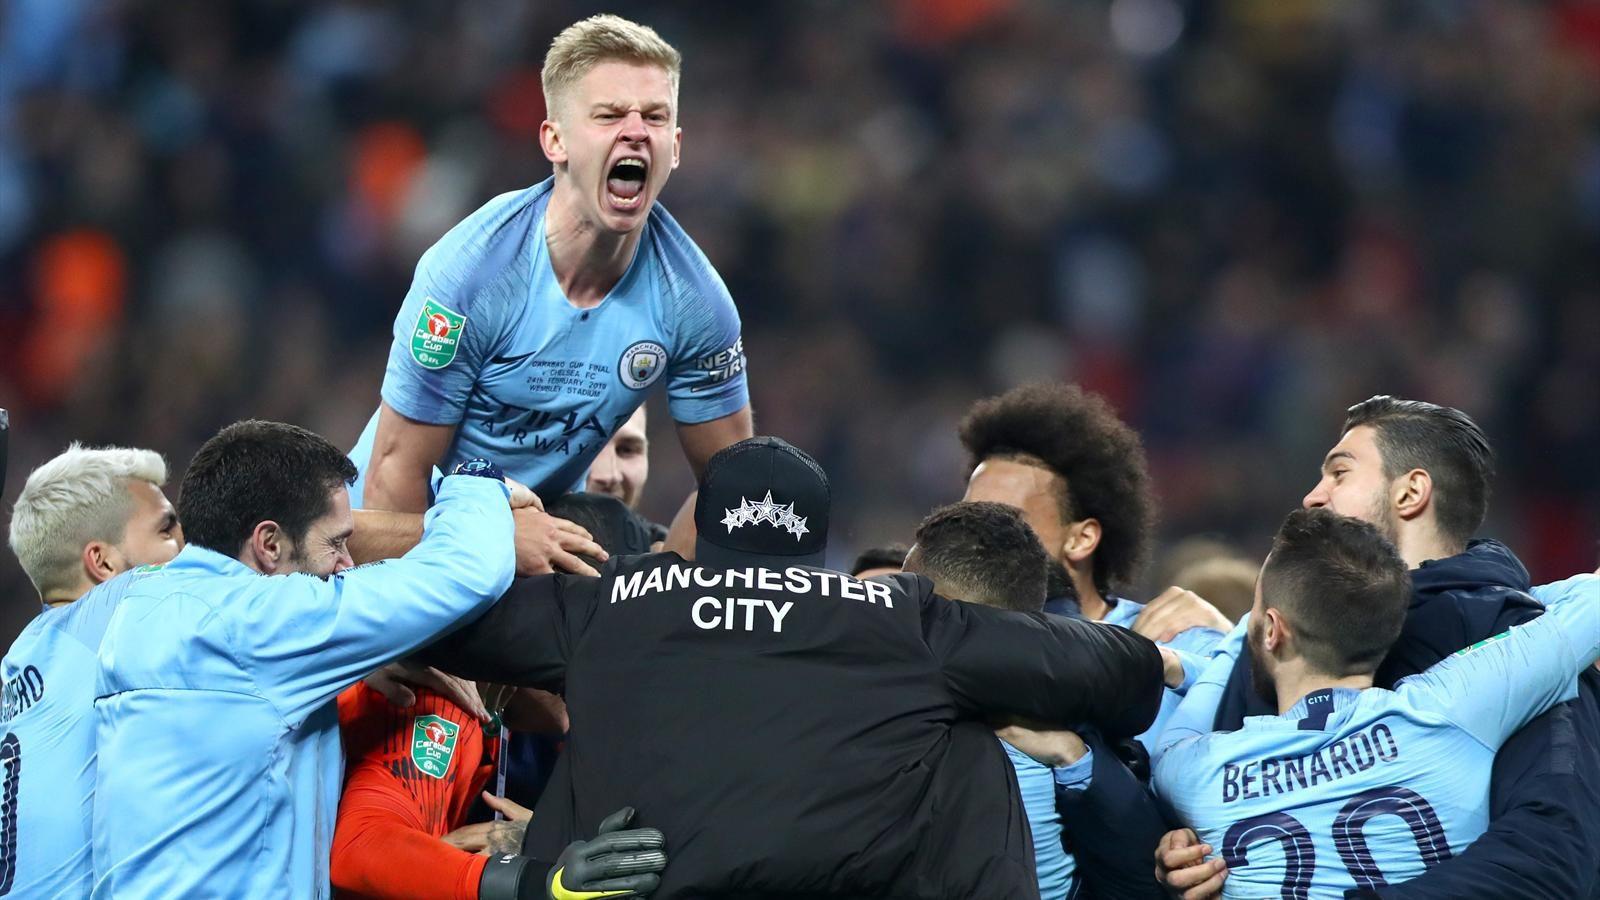 Лига чемпионов УЕФА, Манчестер Сити, премьер-лига Англия, УЕФА